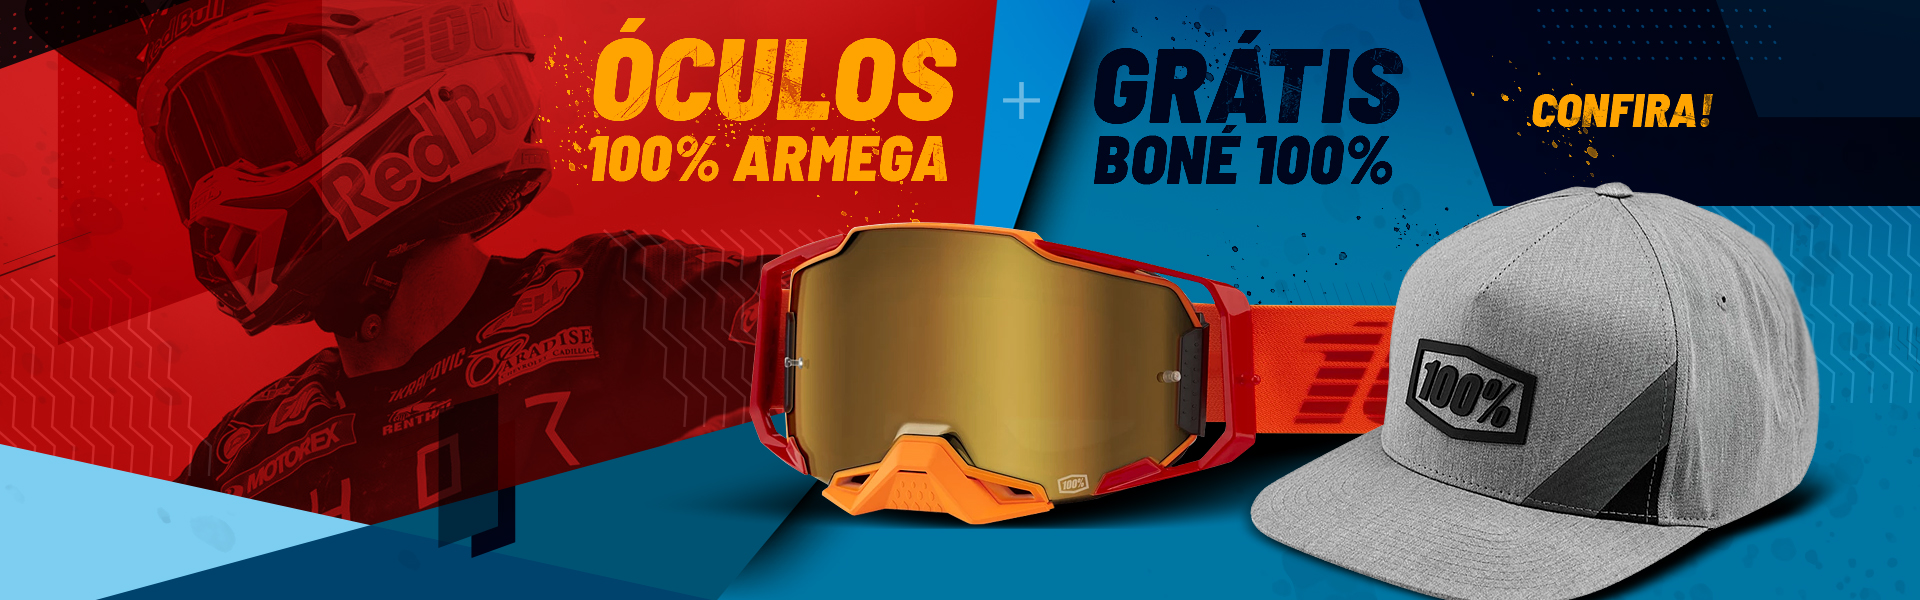 Banners: Óculos 100% Armega - Grátis Boné 100%